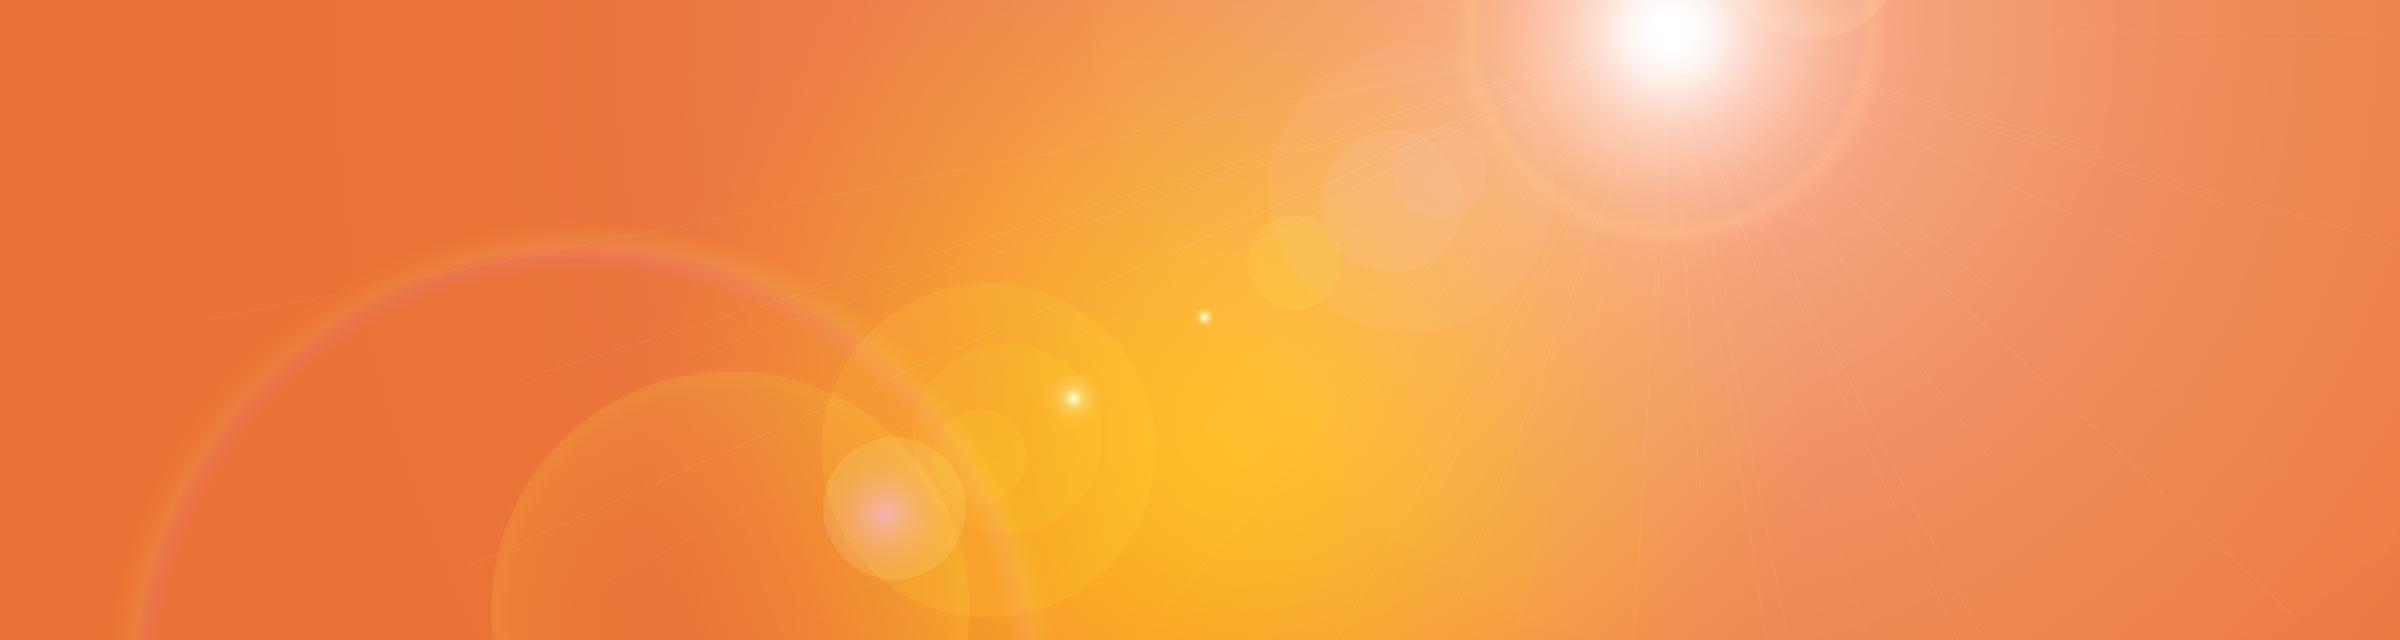 https://www.solargain.com.au/sites/default/files/revslider/image/lowest-price-bg.jpg